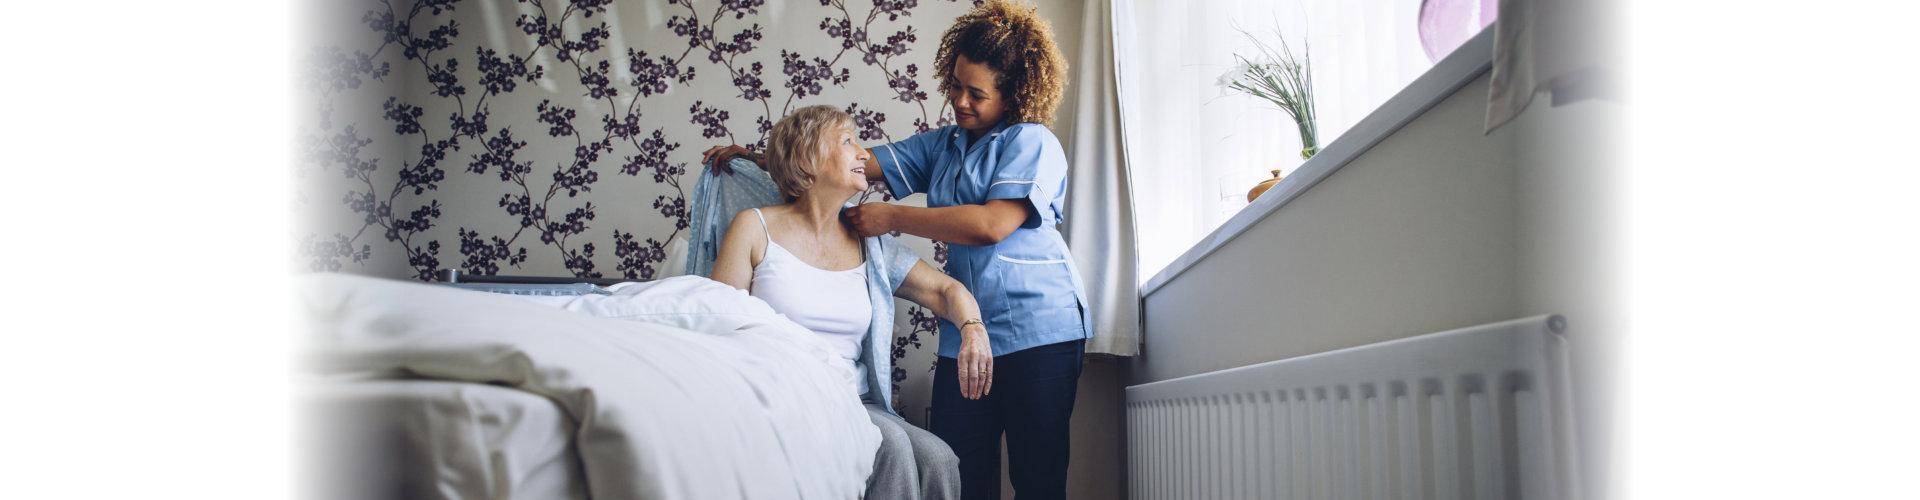 caregiver making senior woman's clothes